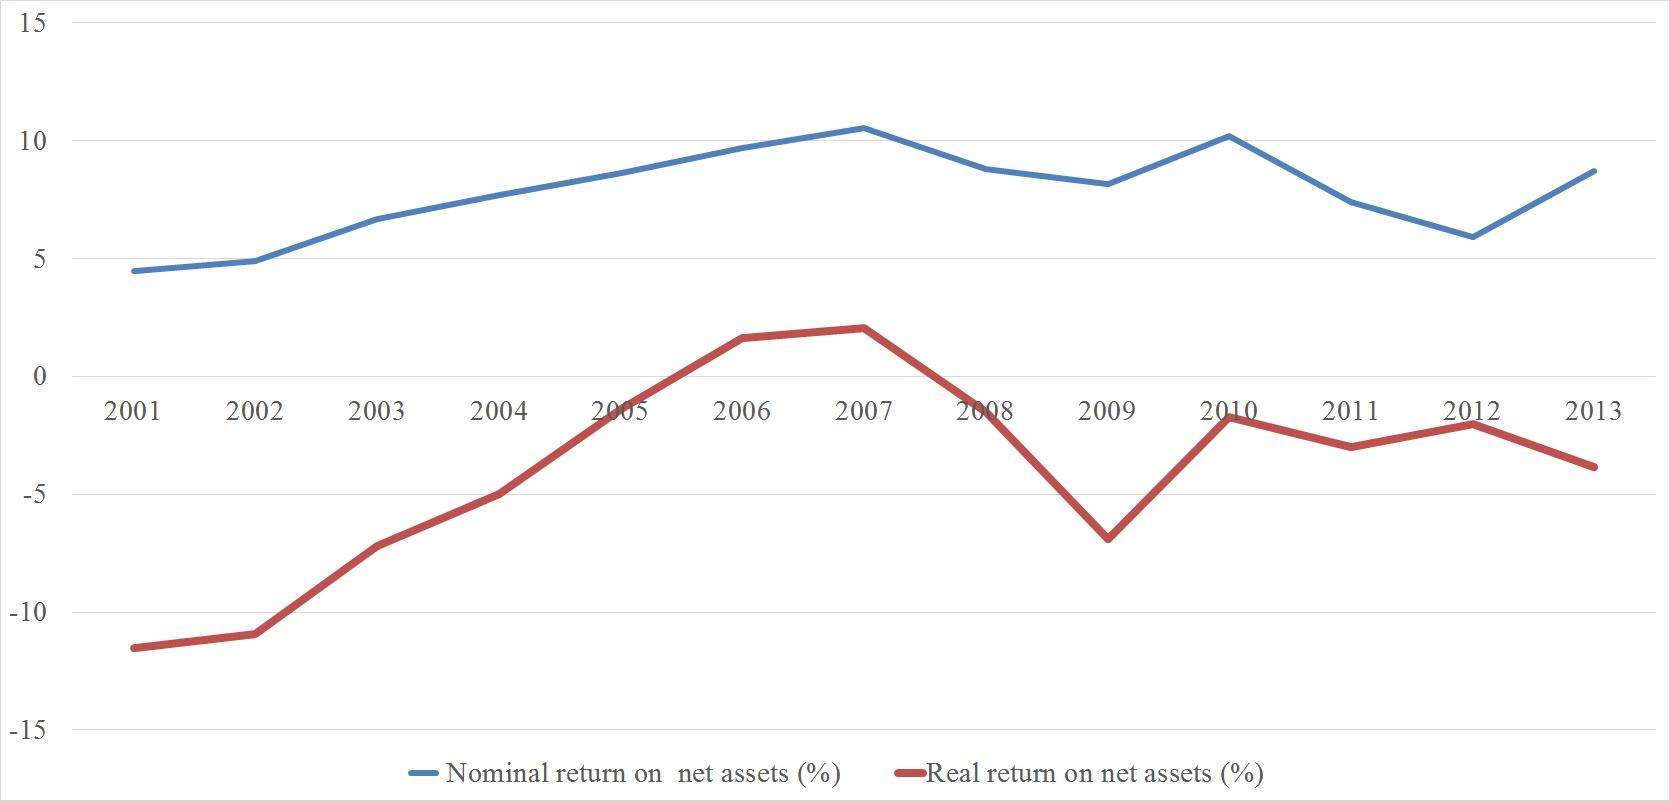 Real return of net assets